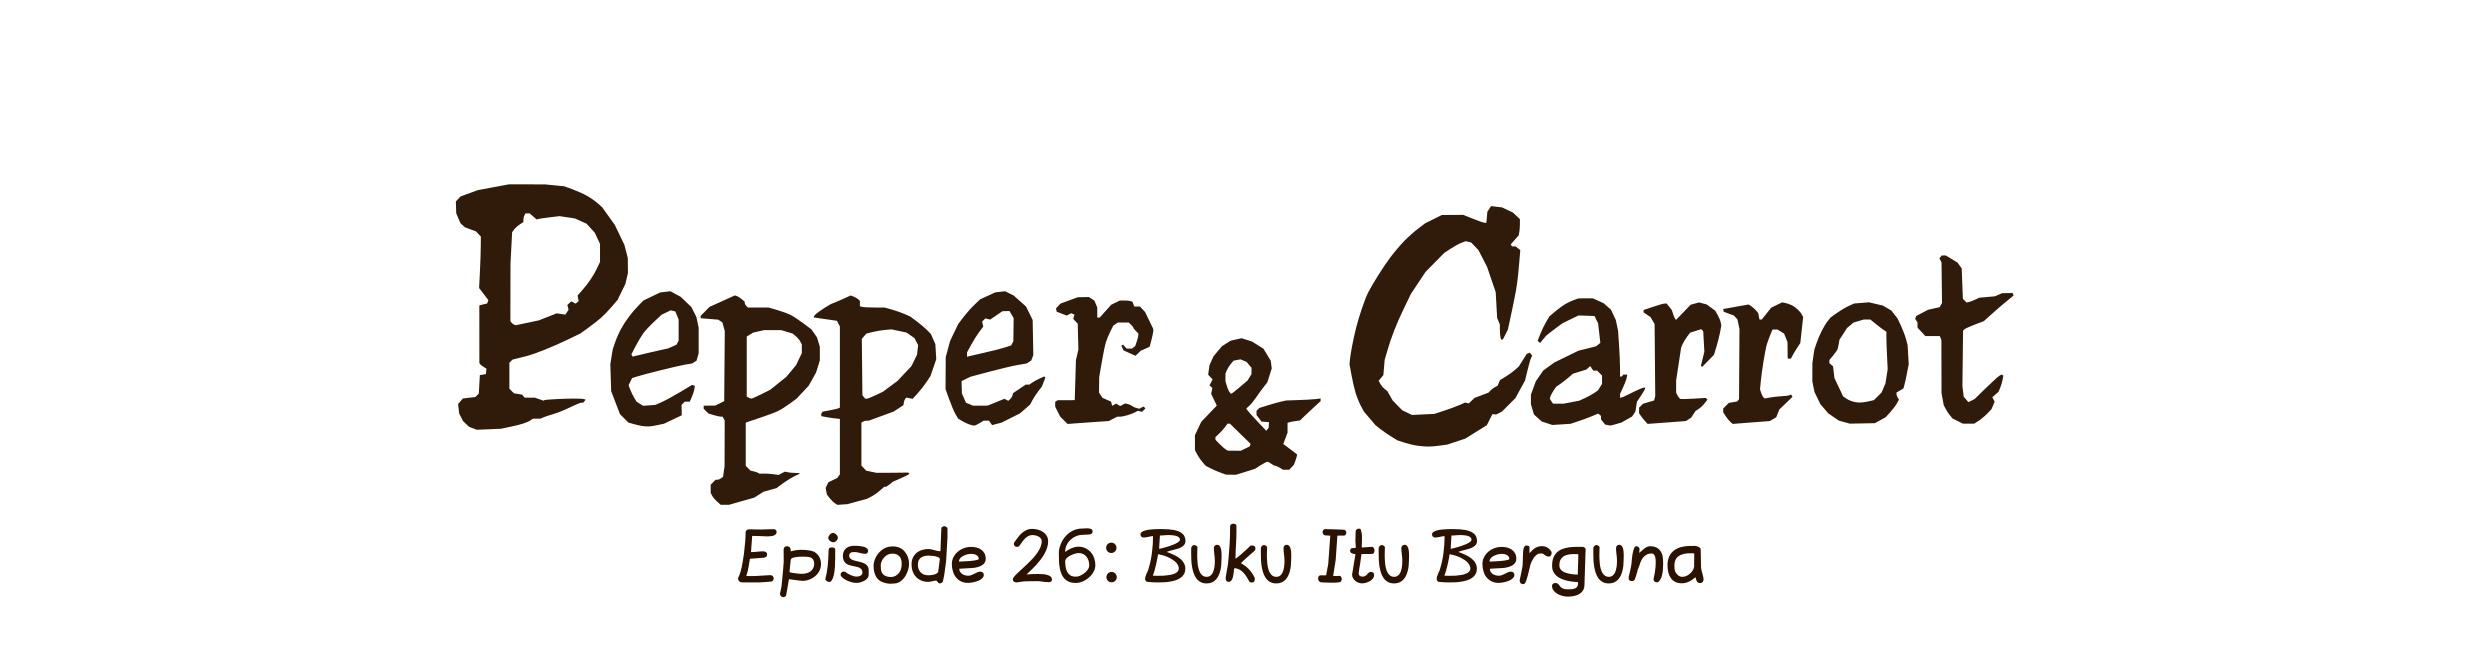 Episode 26: Buku Itu Berguna